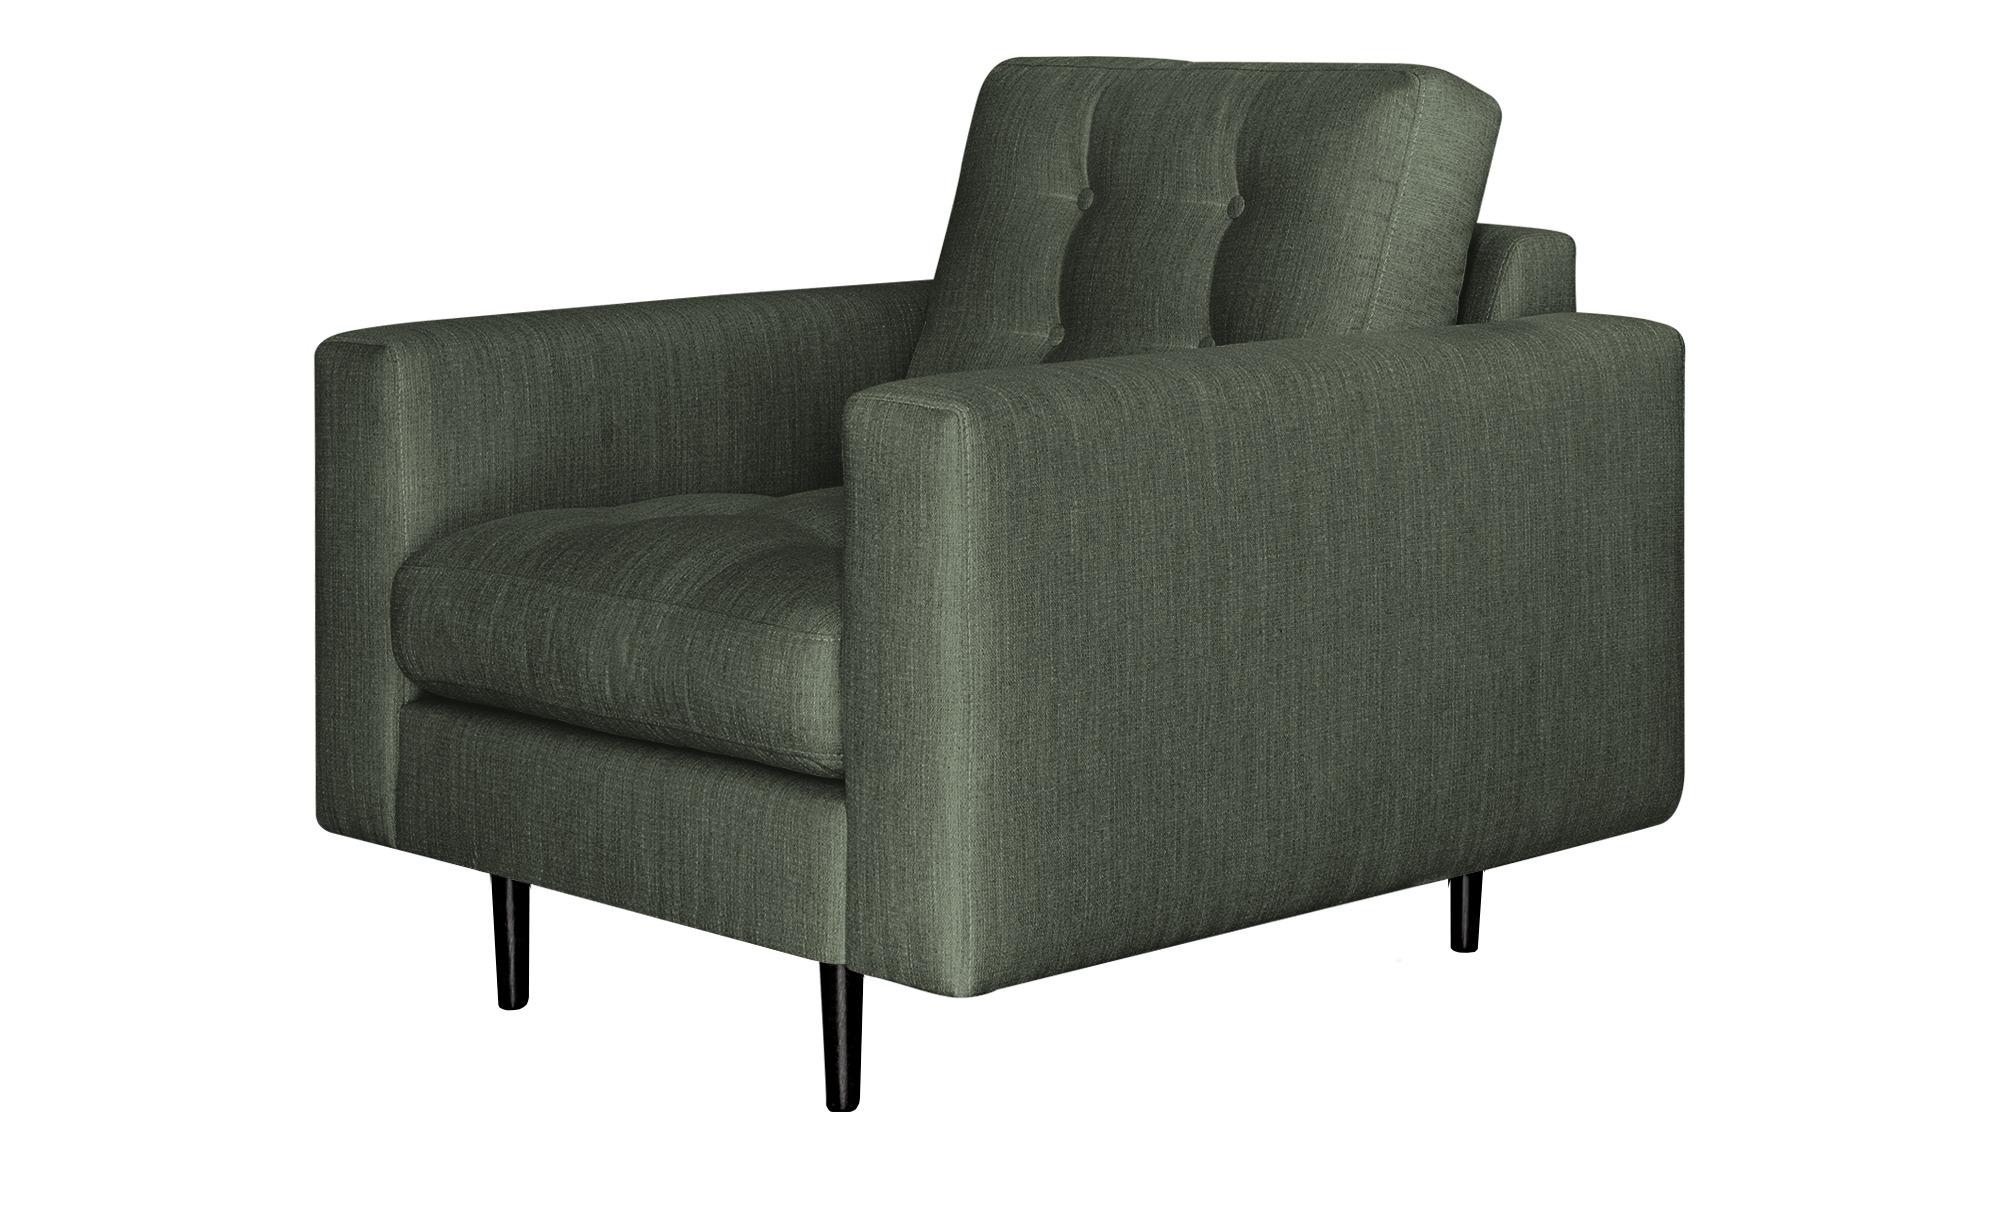 Gray & Jones Sessel  Gypsy ¦ grün ¦ Maße (cm): B: 97 H: 90 T: 92 Polstermöbel > Sessel > Polstersessel - Höffner